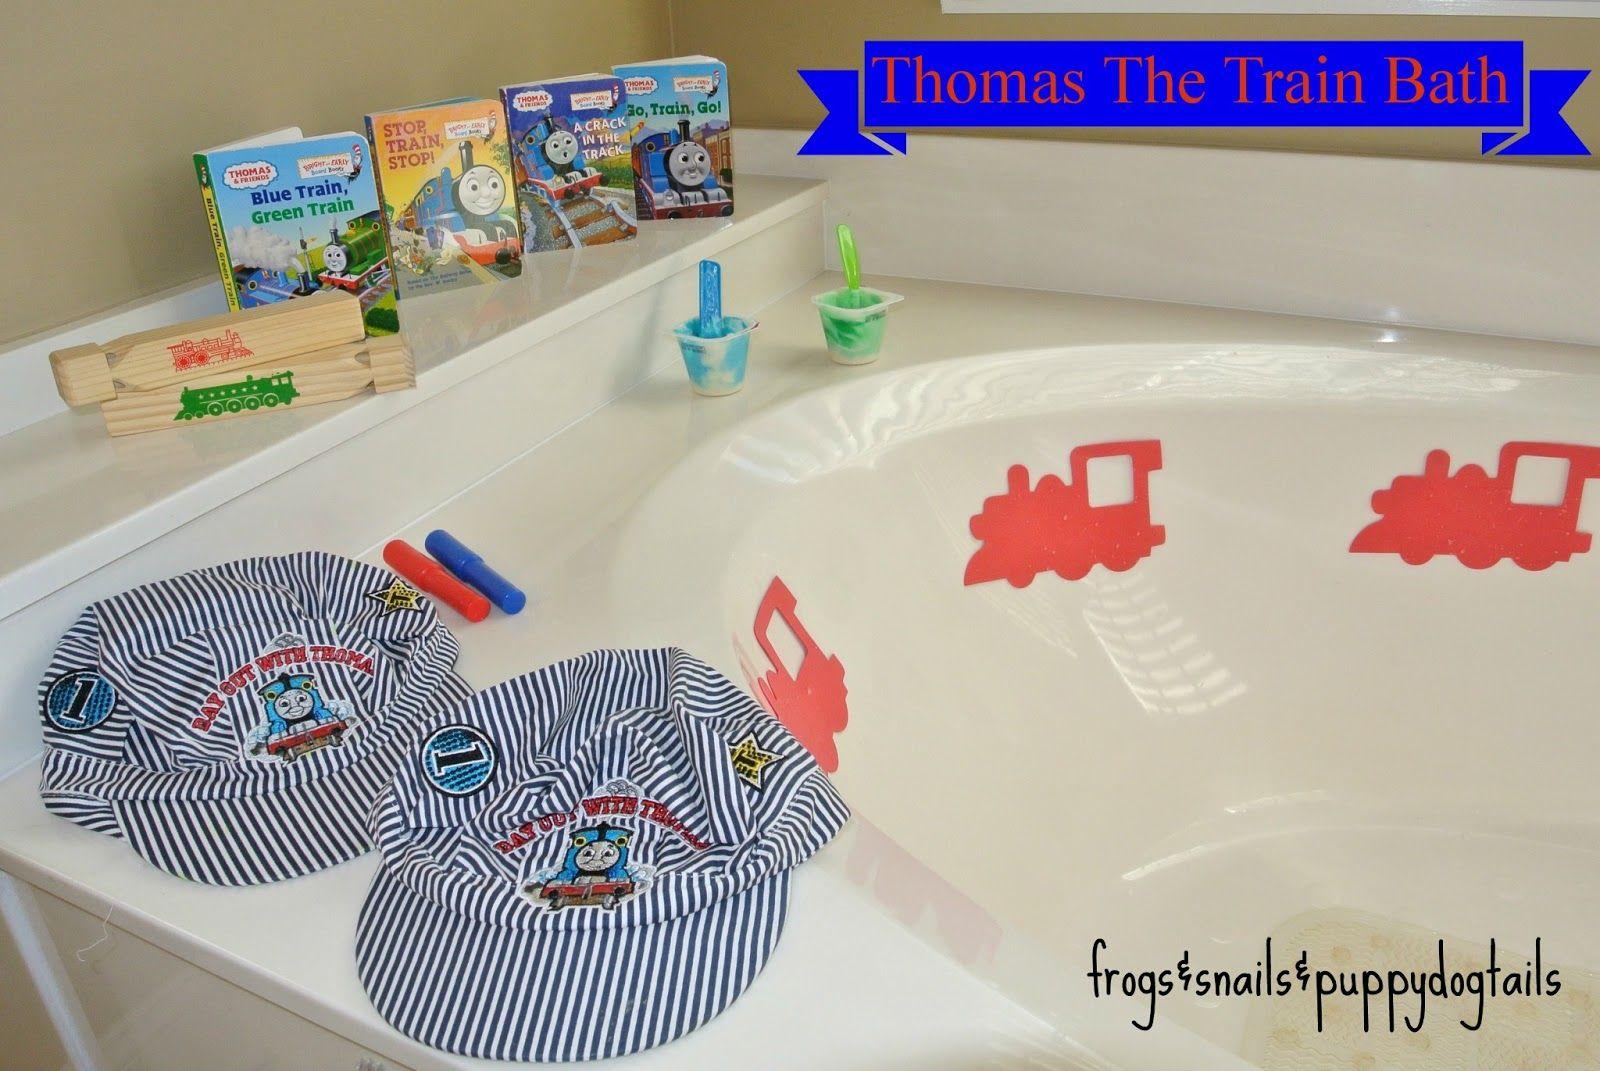 Thomas The Train Bath Preschooler And Toddler Activity